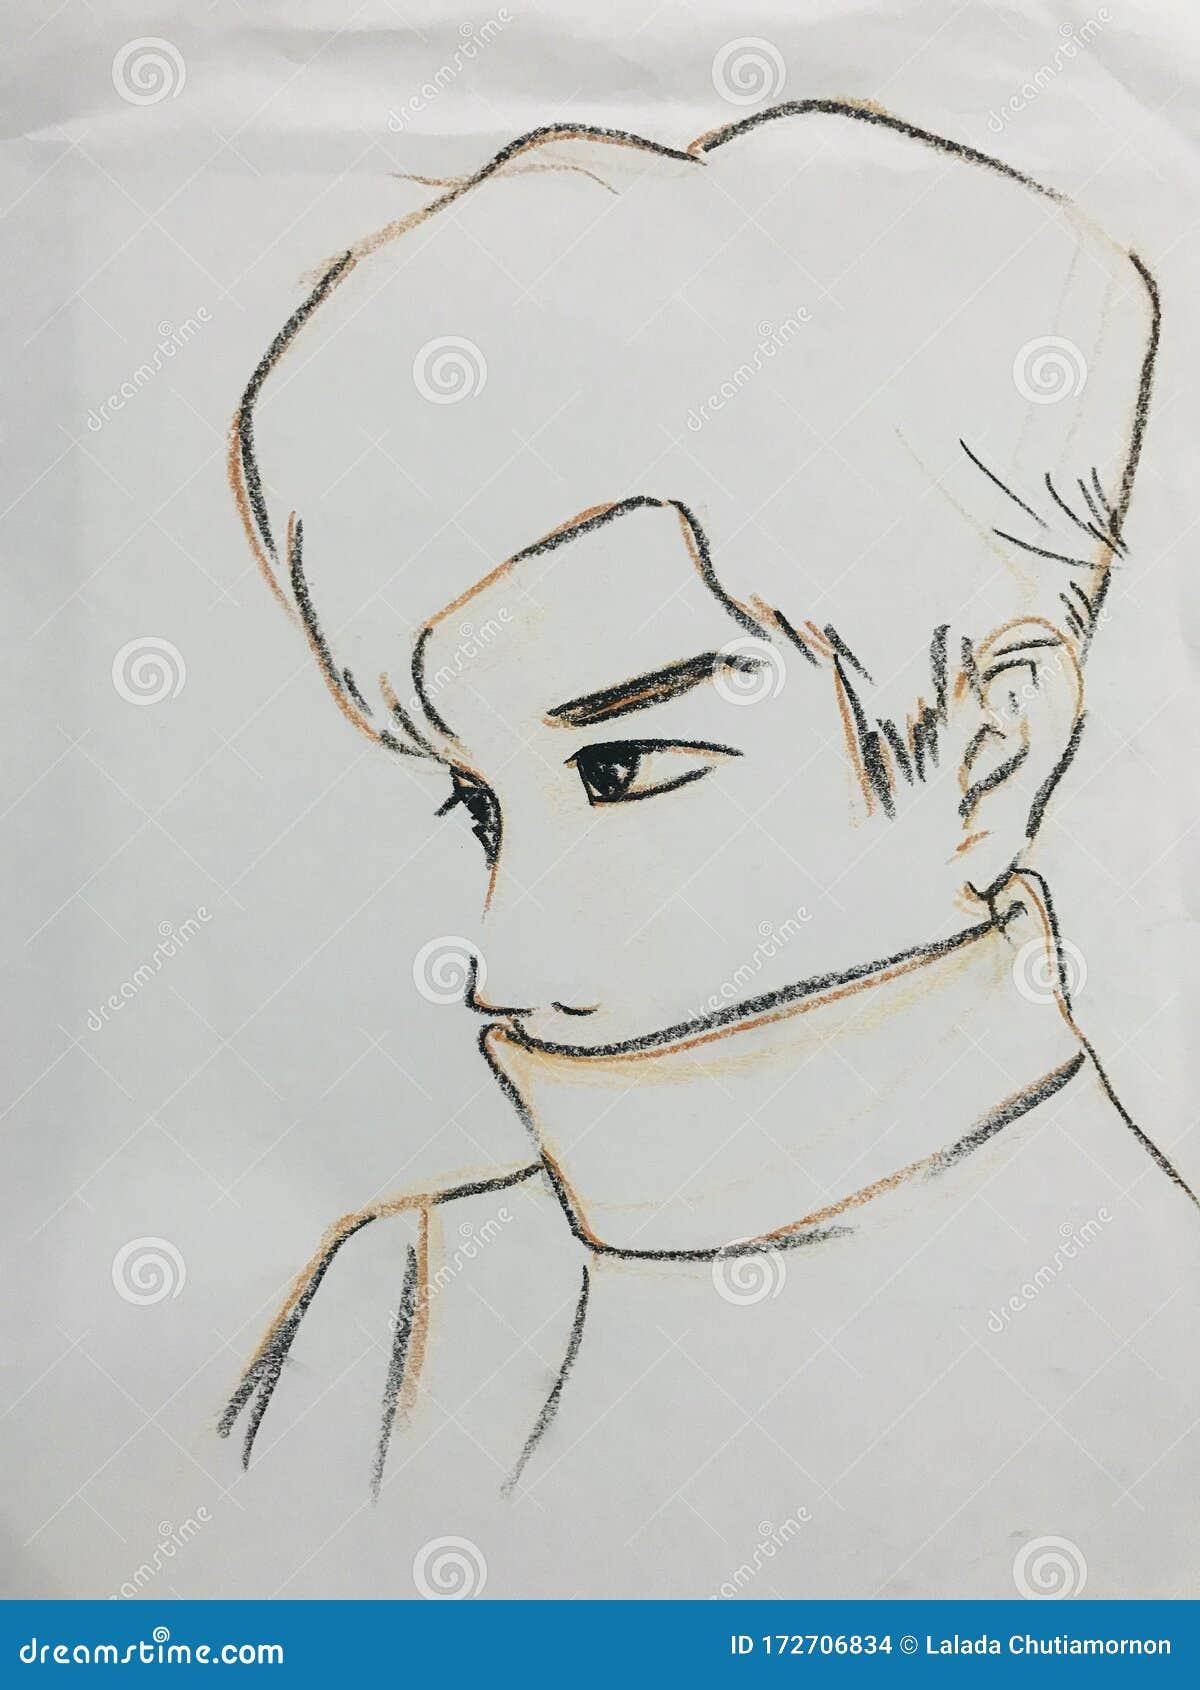 Sketch Of A Cartoon Stock Photo Image Of Darwing Chutiamornon 172706834